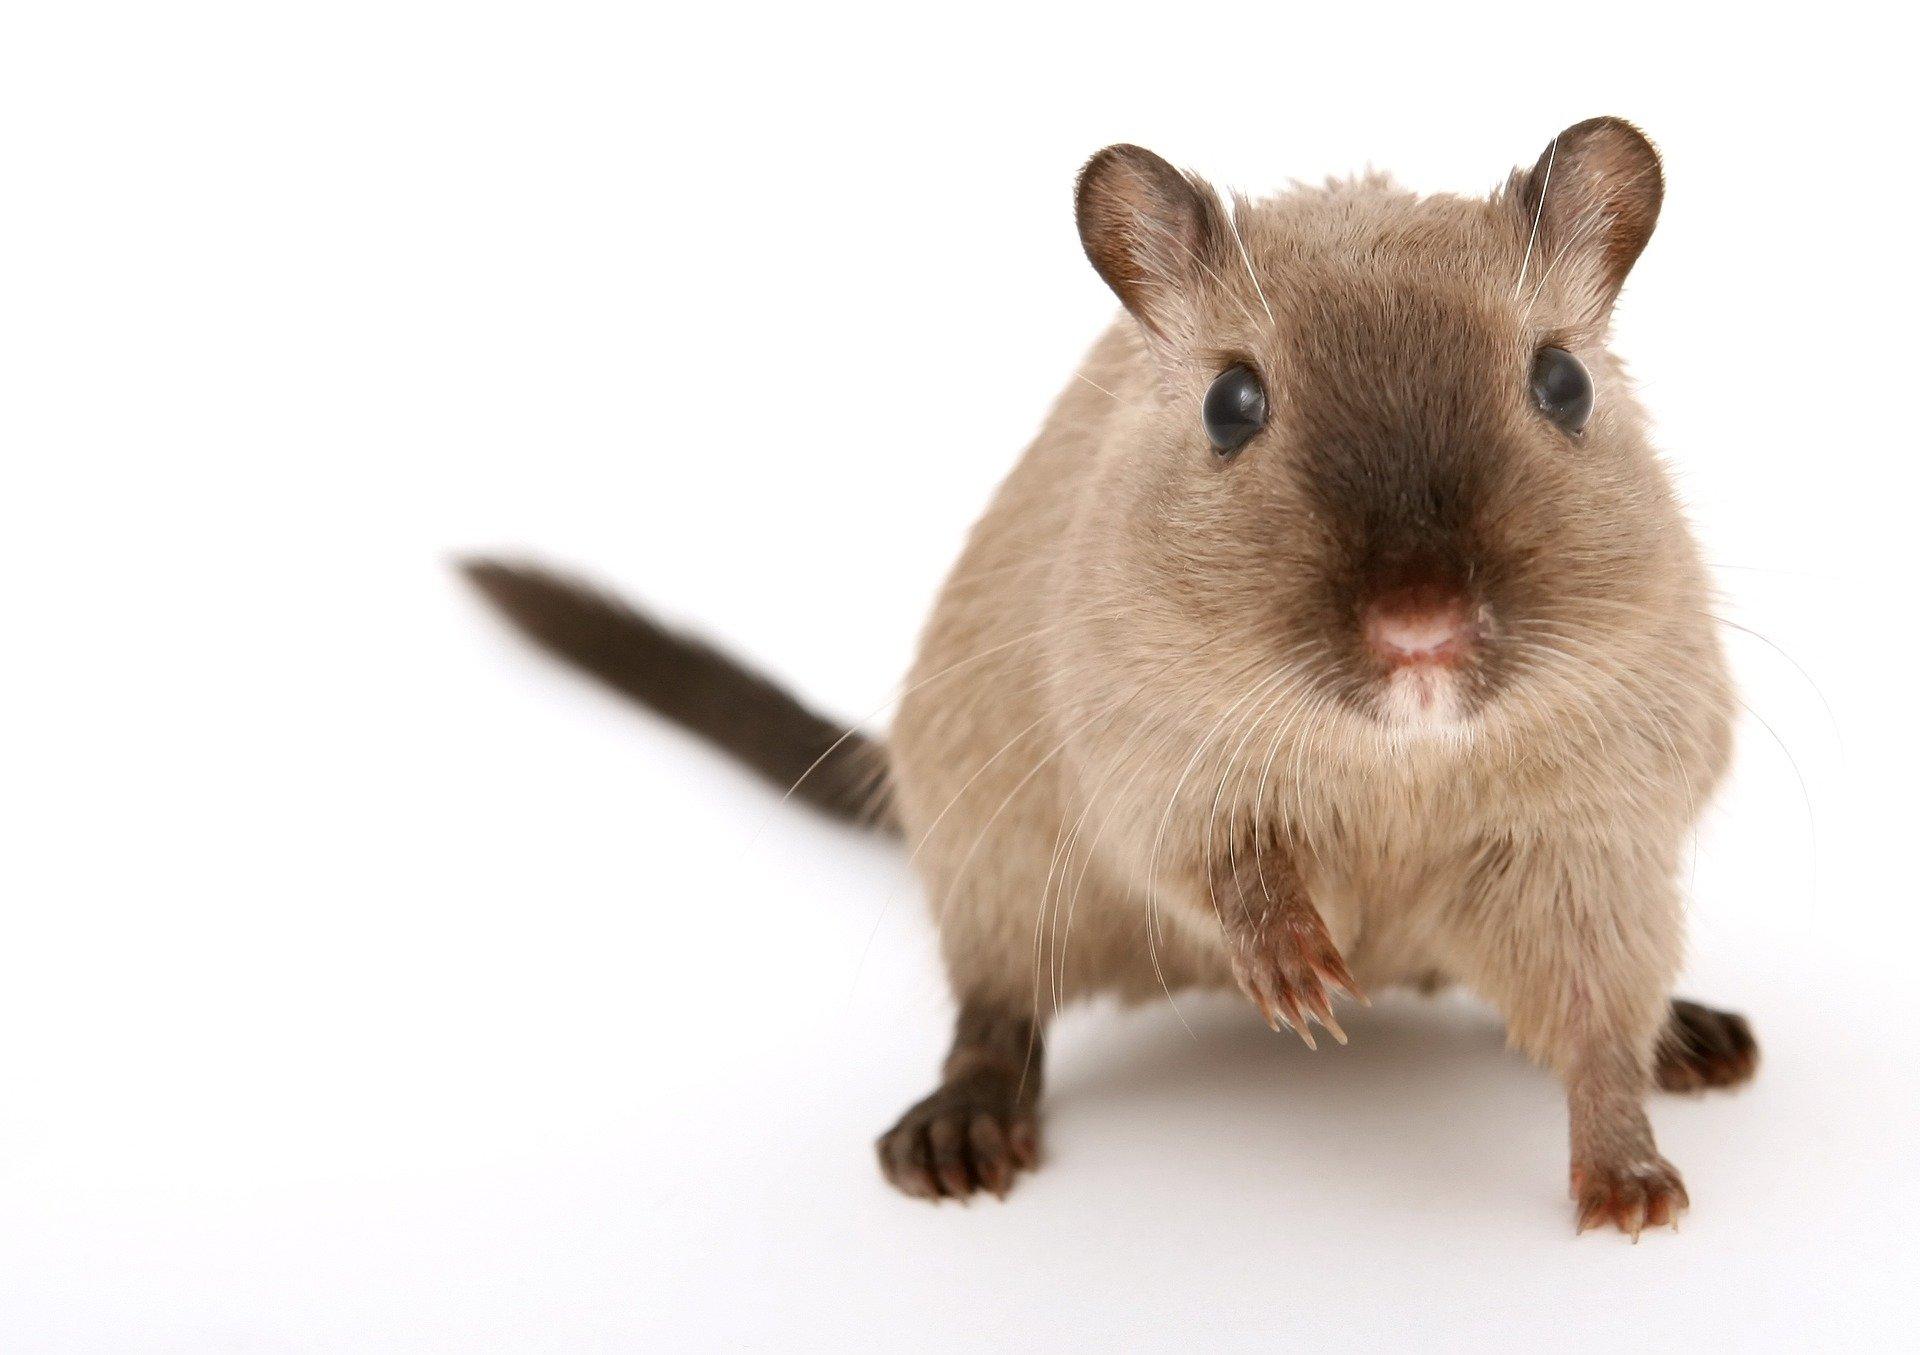 How long do pet rats live?